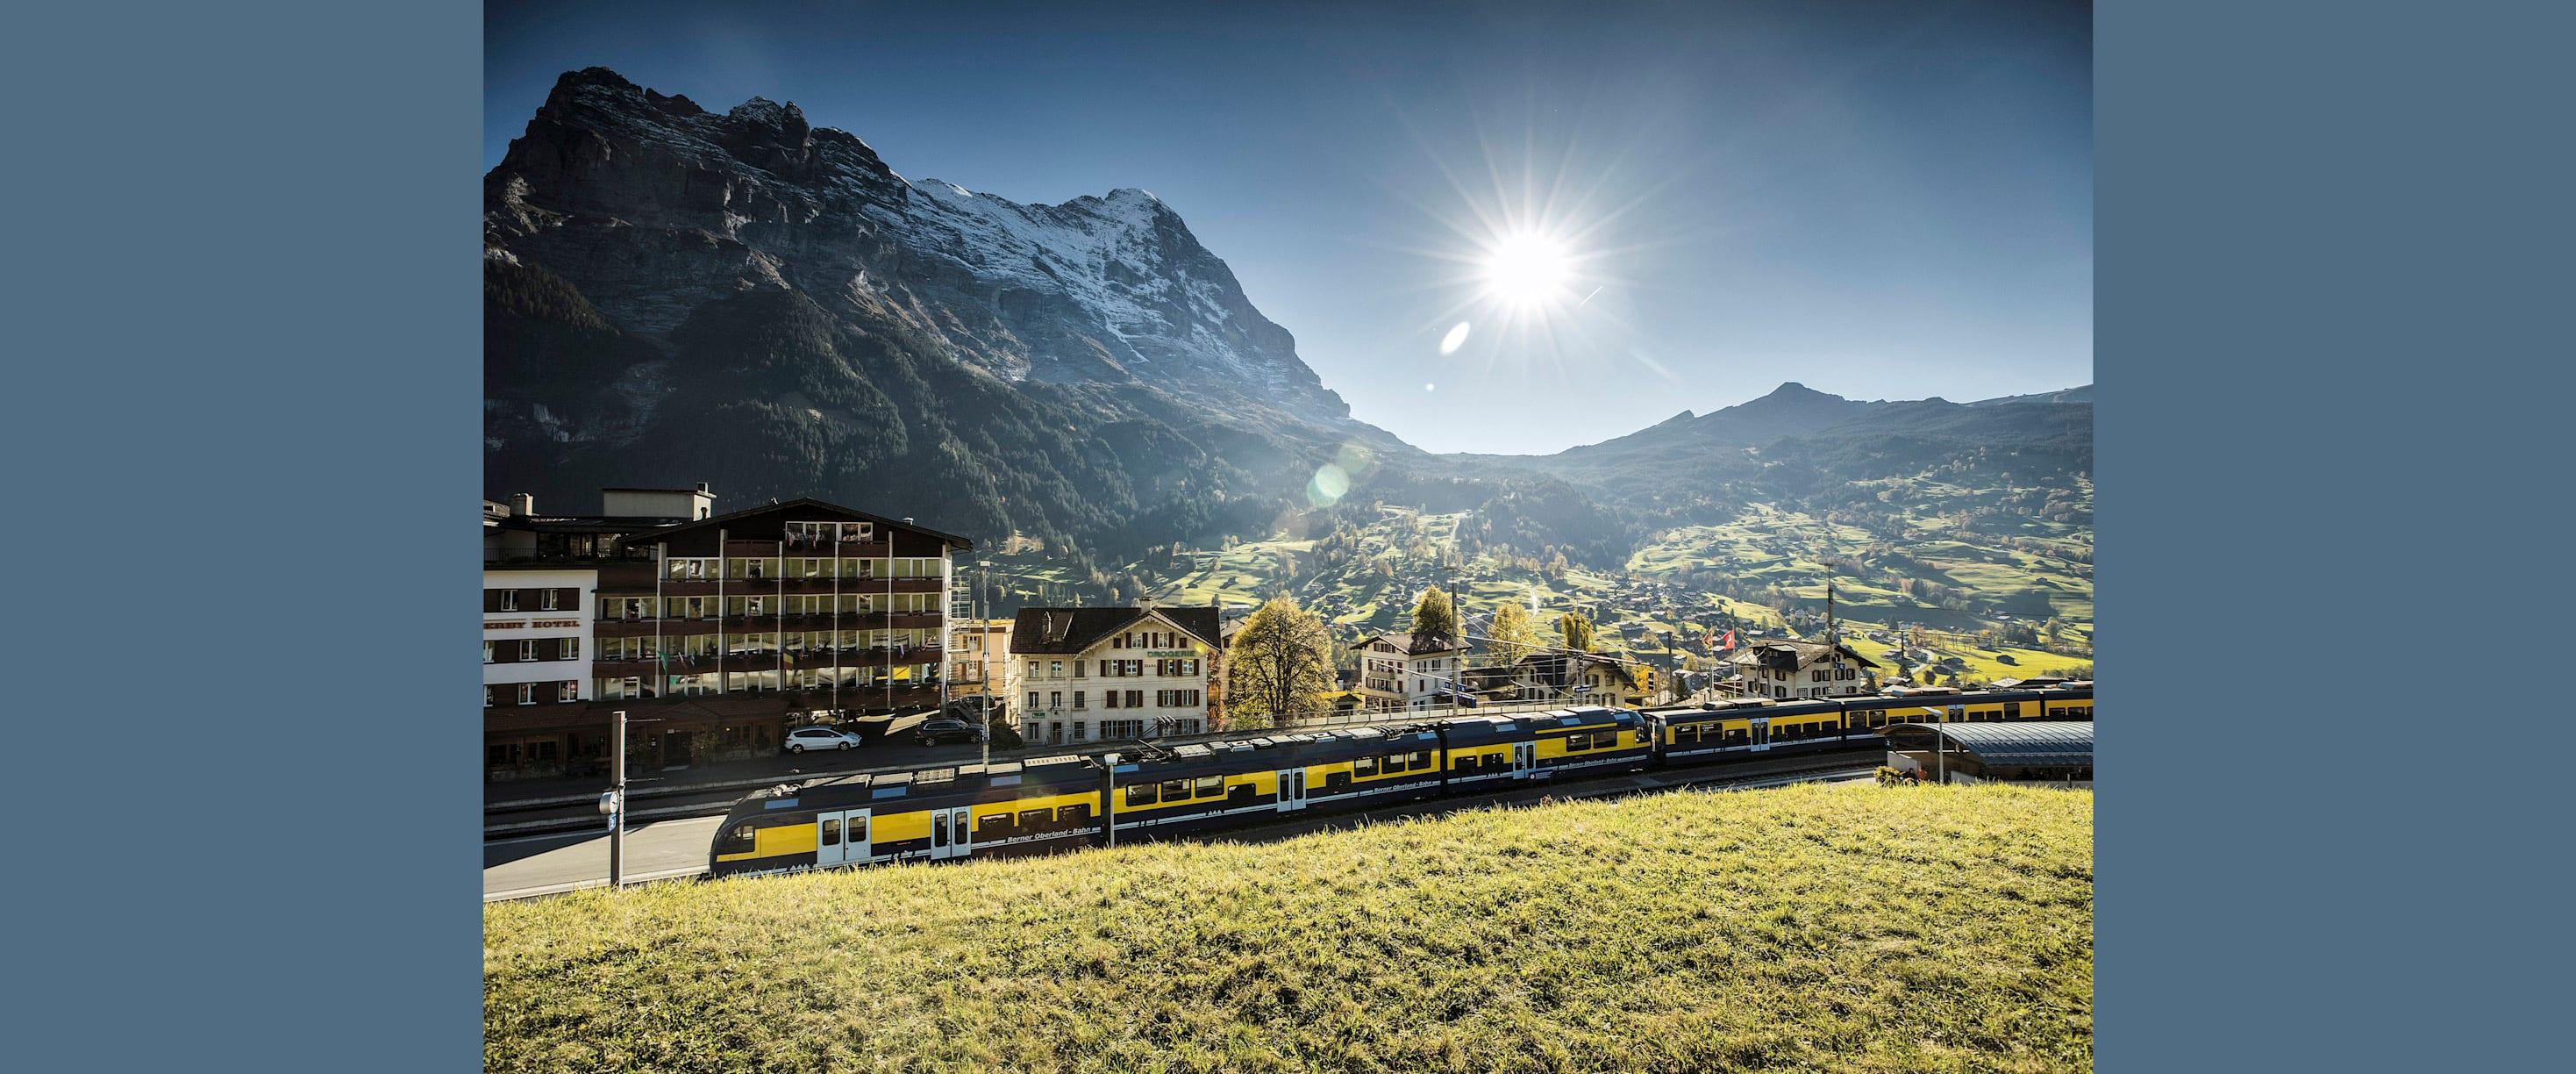 Bilddatenbank, Bilddatenbank-Berner-Oberland-Bahn, Bilddatenbank-Eiger-Nordwand, Bilddatenbank-Sommer, Bilddatenbank-Stichworte, Bilddatenbank-Themen